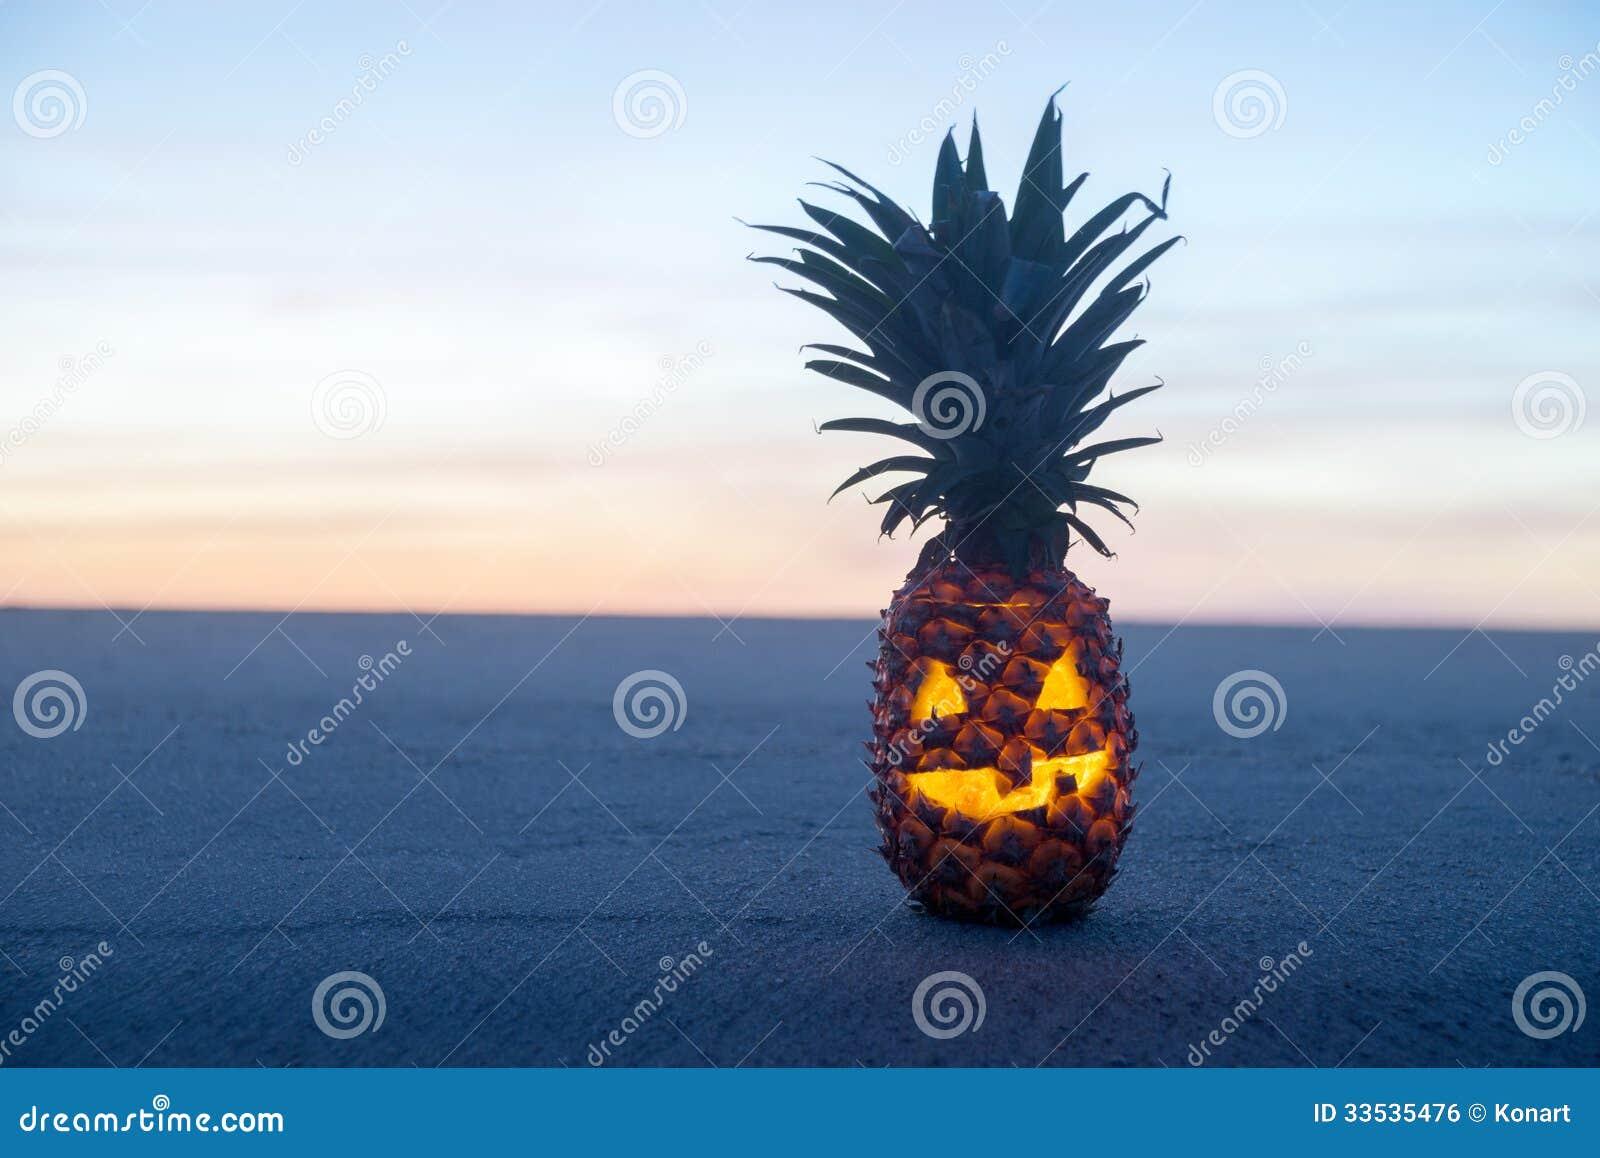 Halloween On Beach. Pineapple Jack O Lantern Royalty Free Stock ...